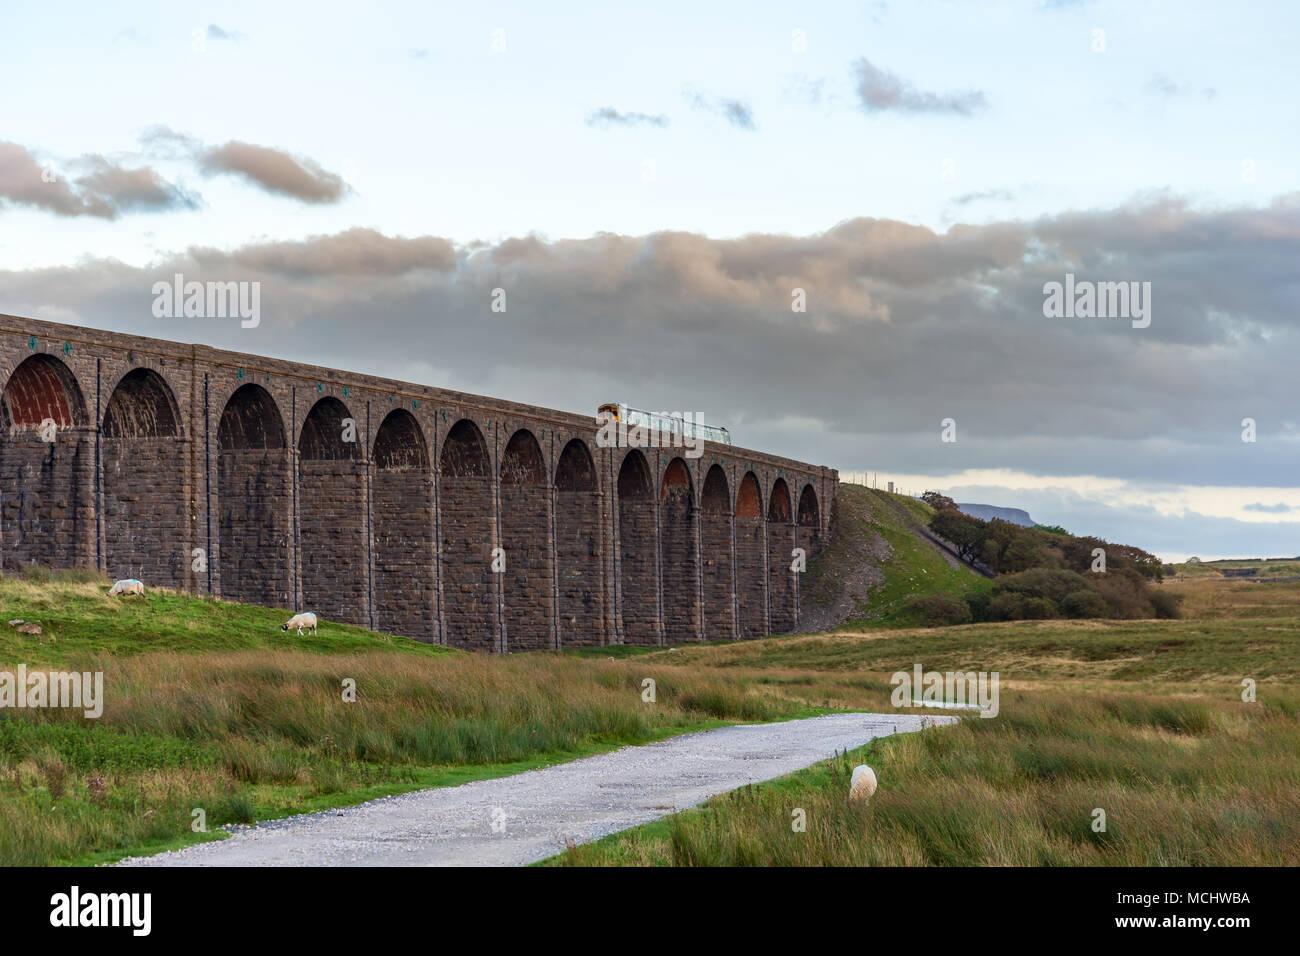 Near Ingleton, North Yorkshire, England, UK - September 11, 2016: A train passing the Ribblehead Viaduct on the Settle-Carlisle Railway - Stock Image